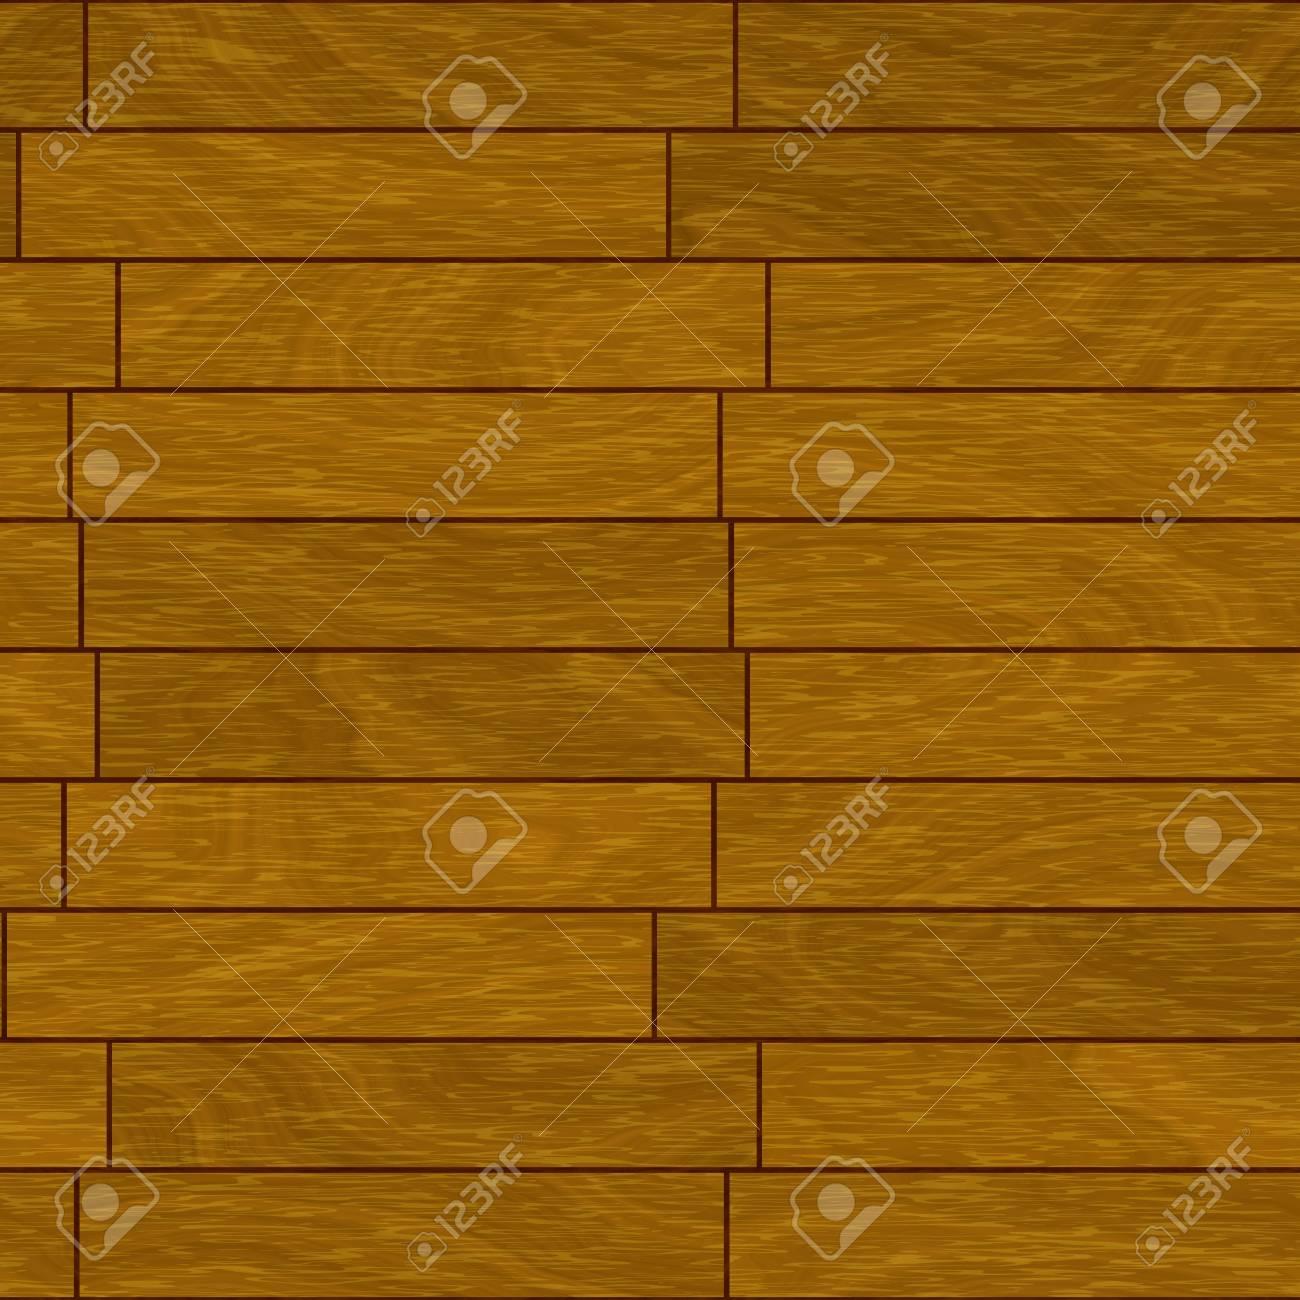 Wooden parquet flooring surface pattern texture seamless background Stock Photo - 5158558